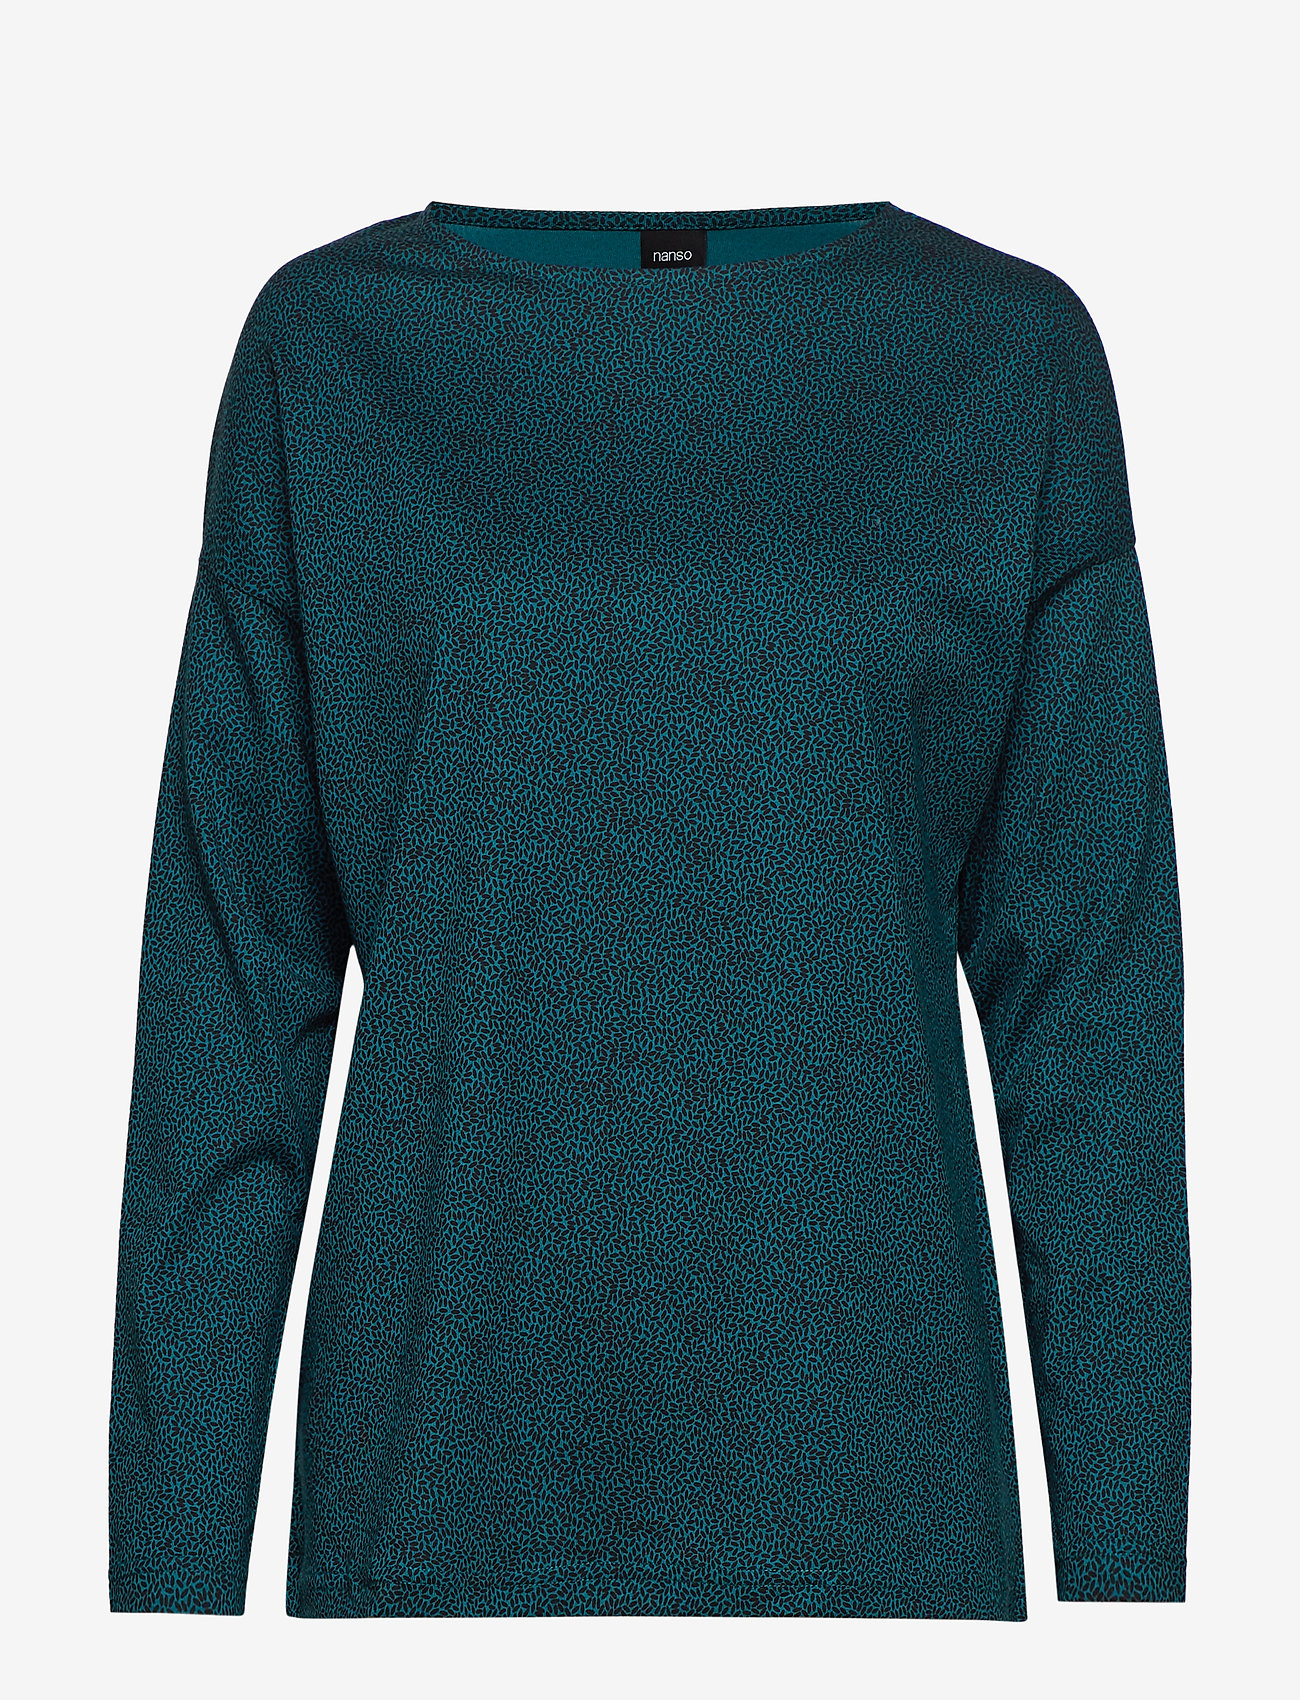 Nanso - Ladies blouse, Riisi - neulepuserot - petrol - 0